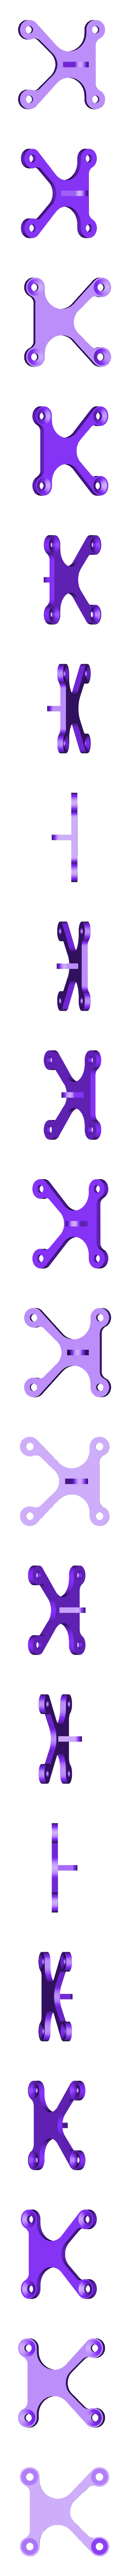 launch_top_65mm.obj Download free OBJ file Launchpad Tiny 65mm • 3D printer model, PaulDrones